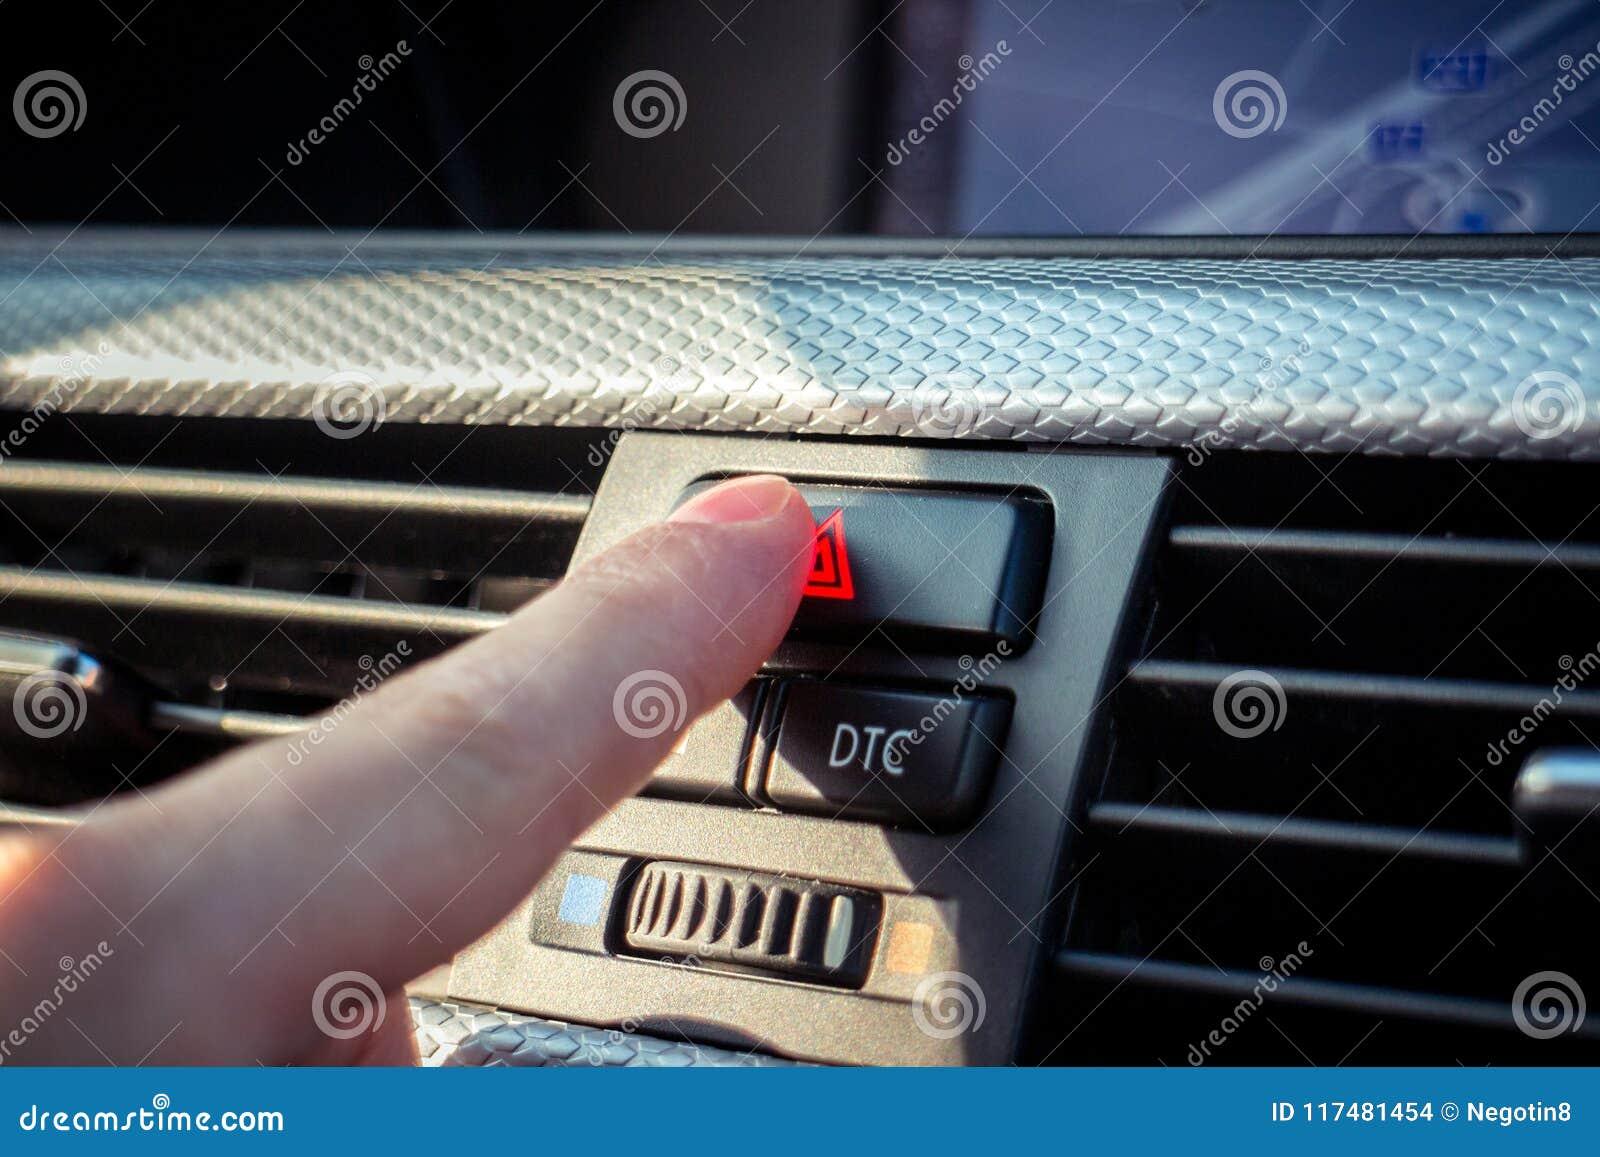 Car interior and details